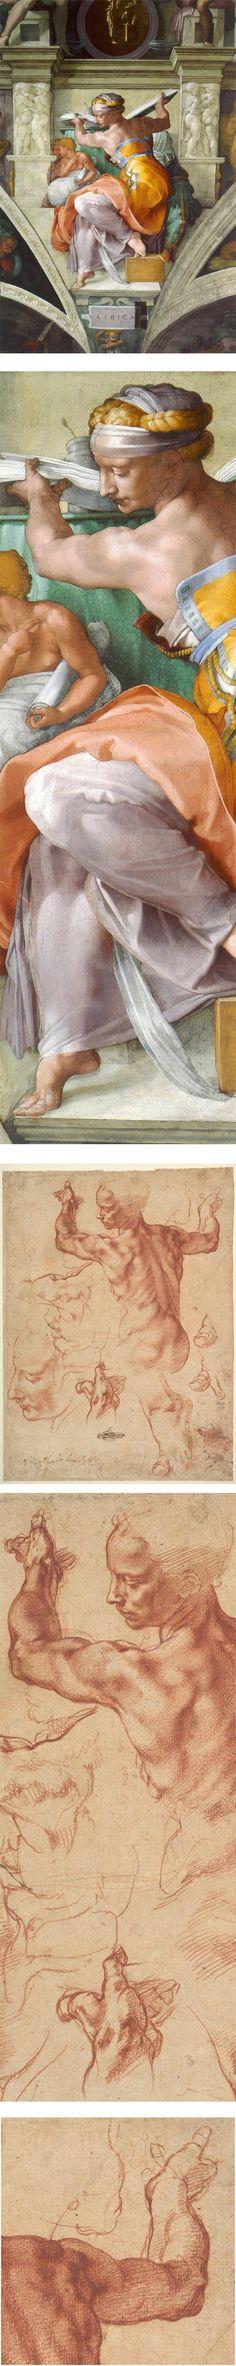 Michelangelo's Libyan Sibyl and Studies